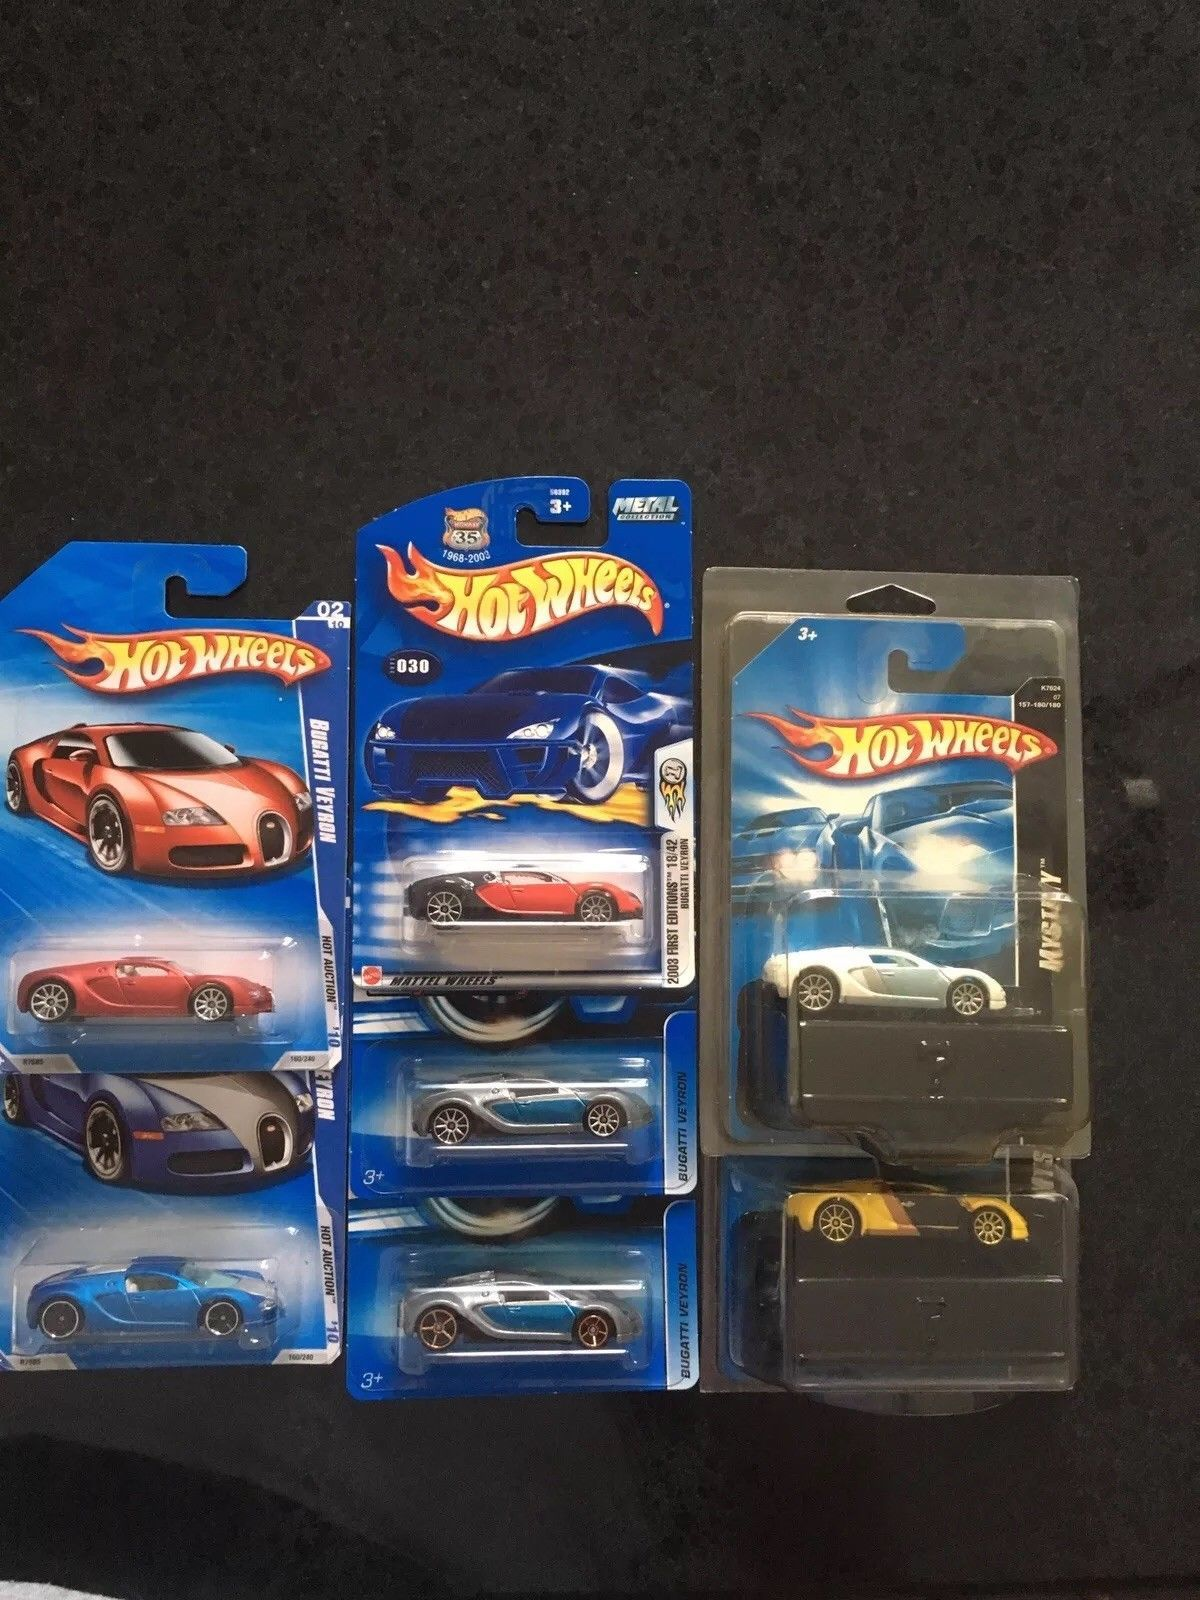 ed1198429324588526e7aa363c9d54ee Elegant Bugatti Veyron toy Car Hot Wheels Cars Trend